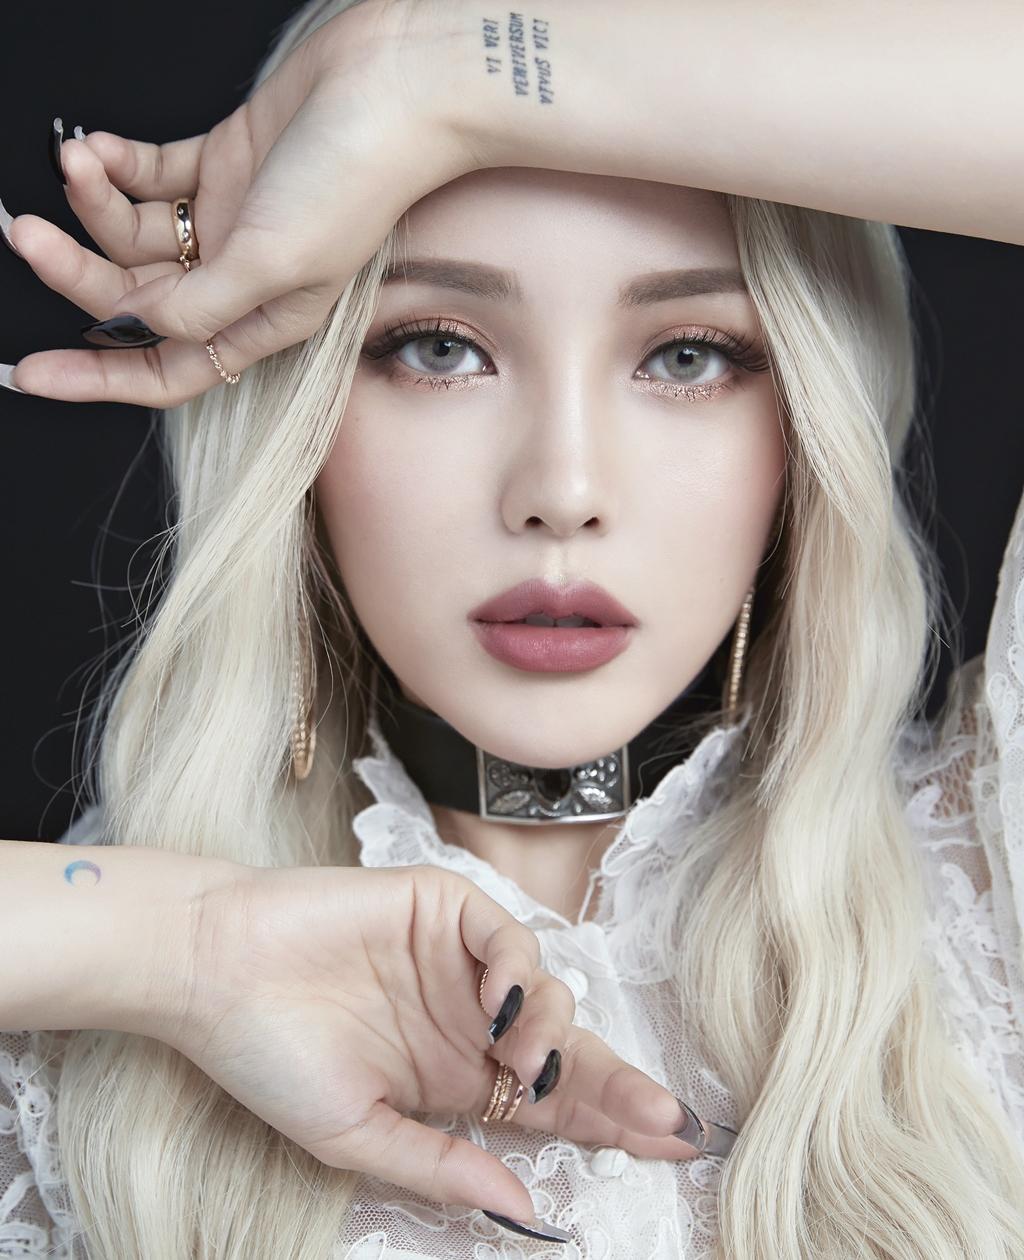 <b>人气美妆博主PONY变身歌手发行单曲专辑《DIVINE》展梦幻魅力</b>